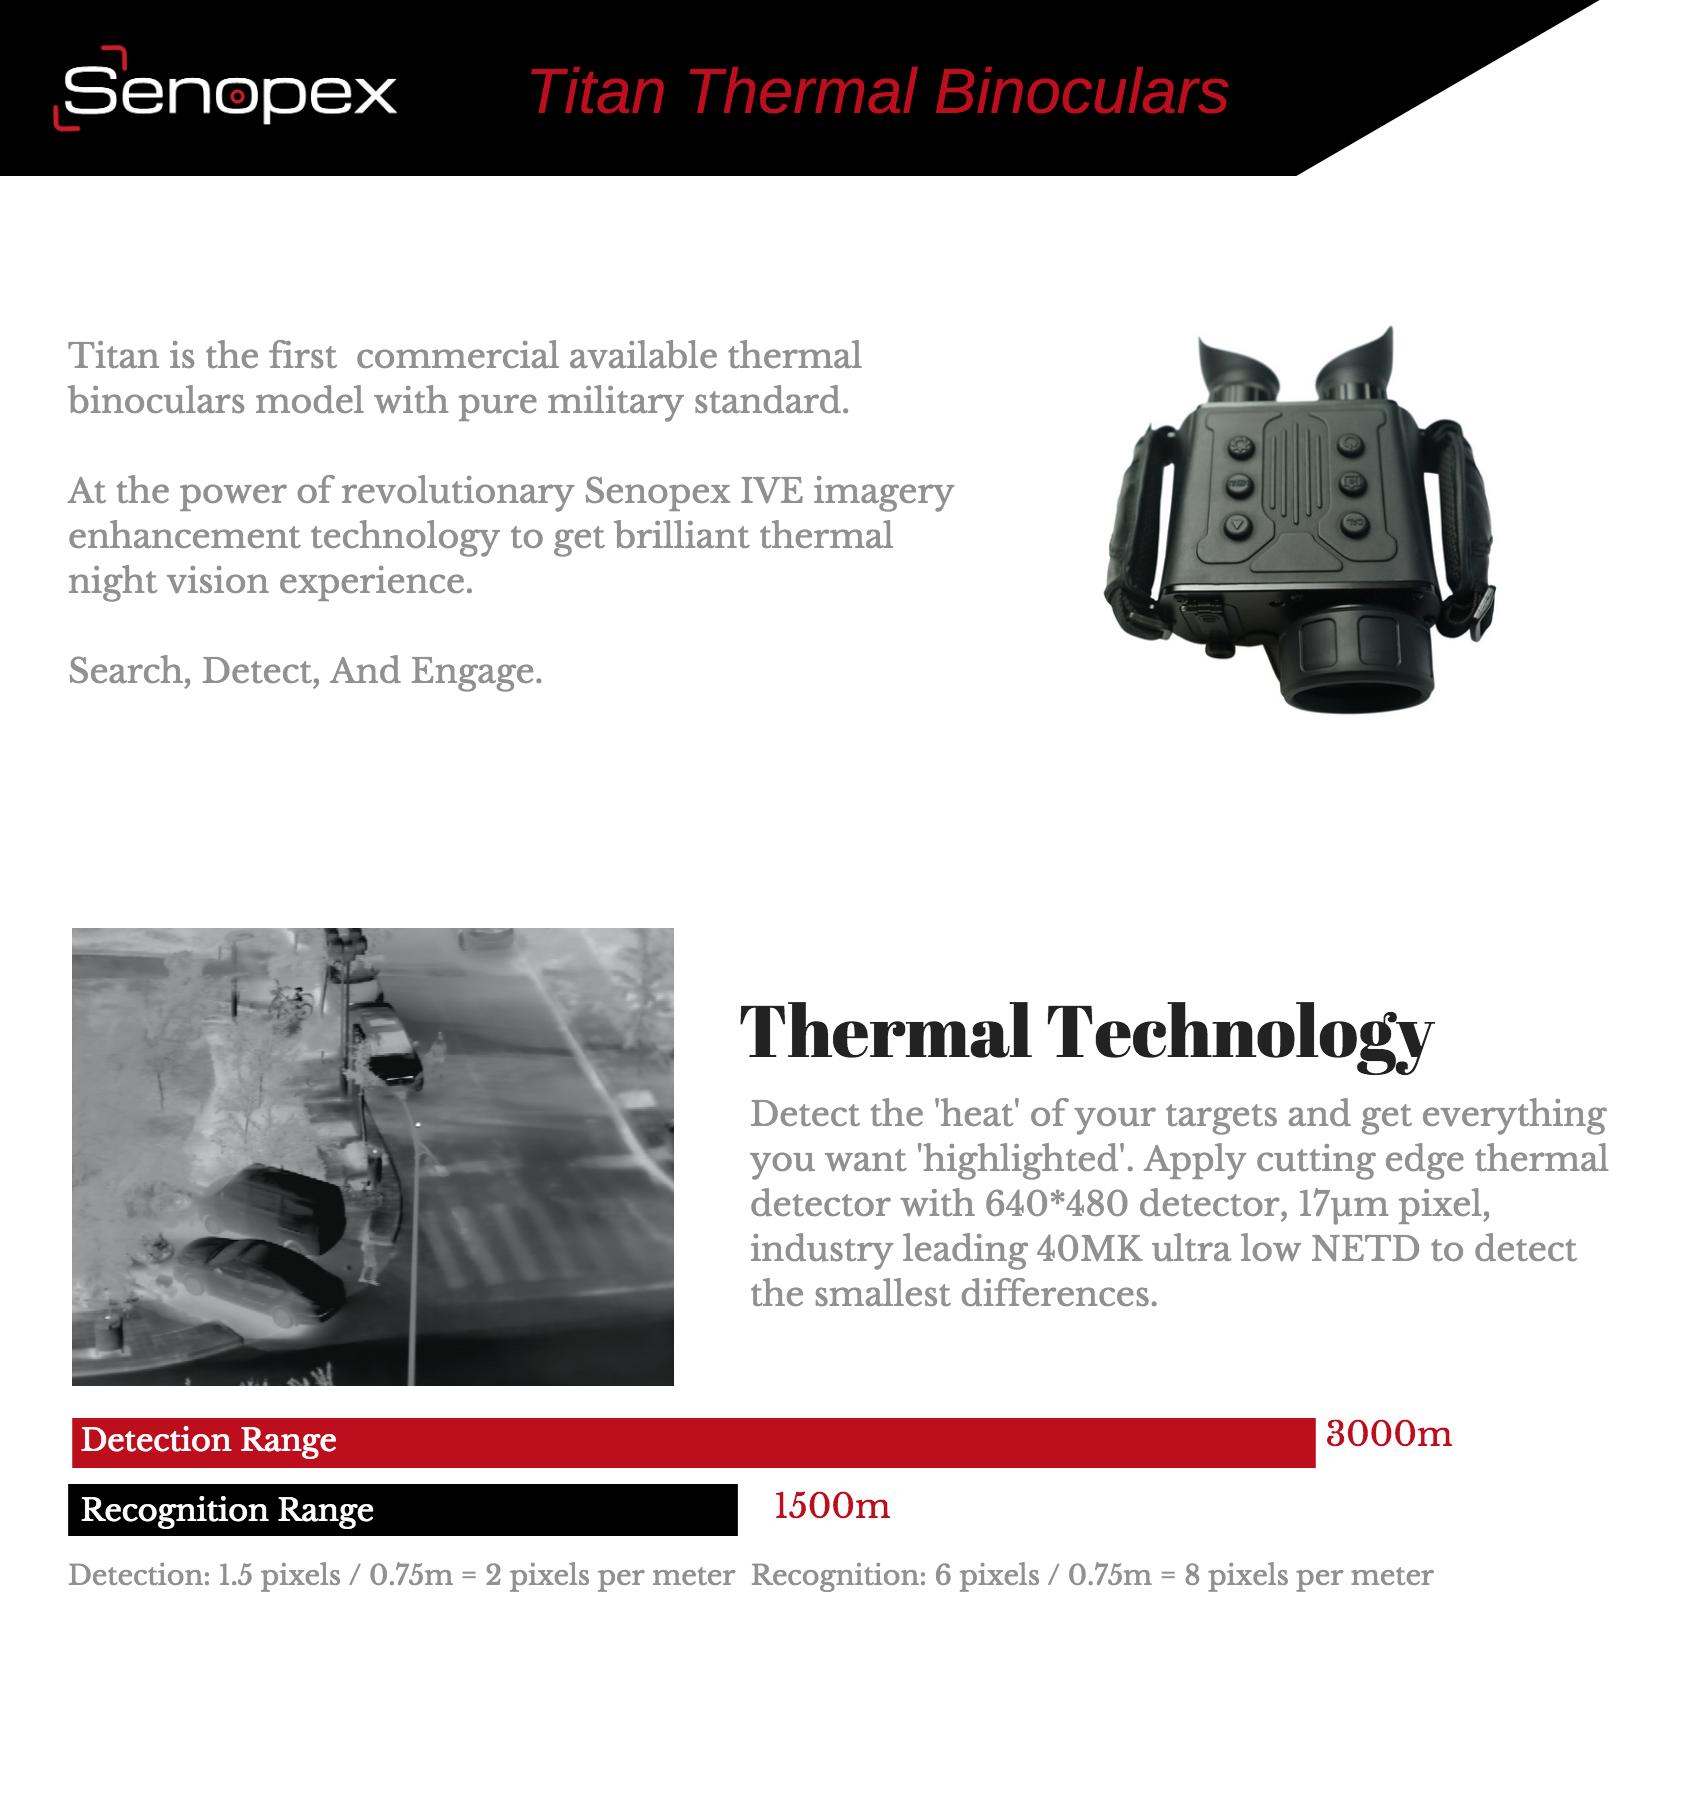 Best Hunting Thermal Night Vision Binoculars With 4000m Detection Range